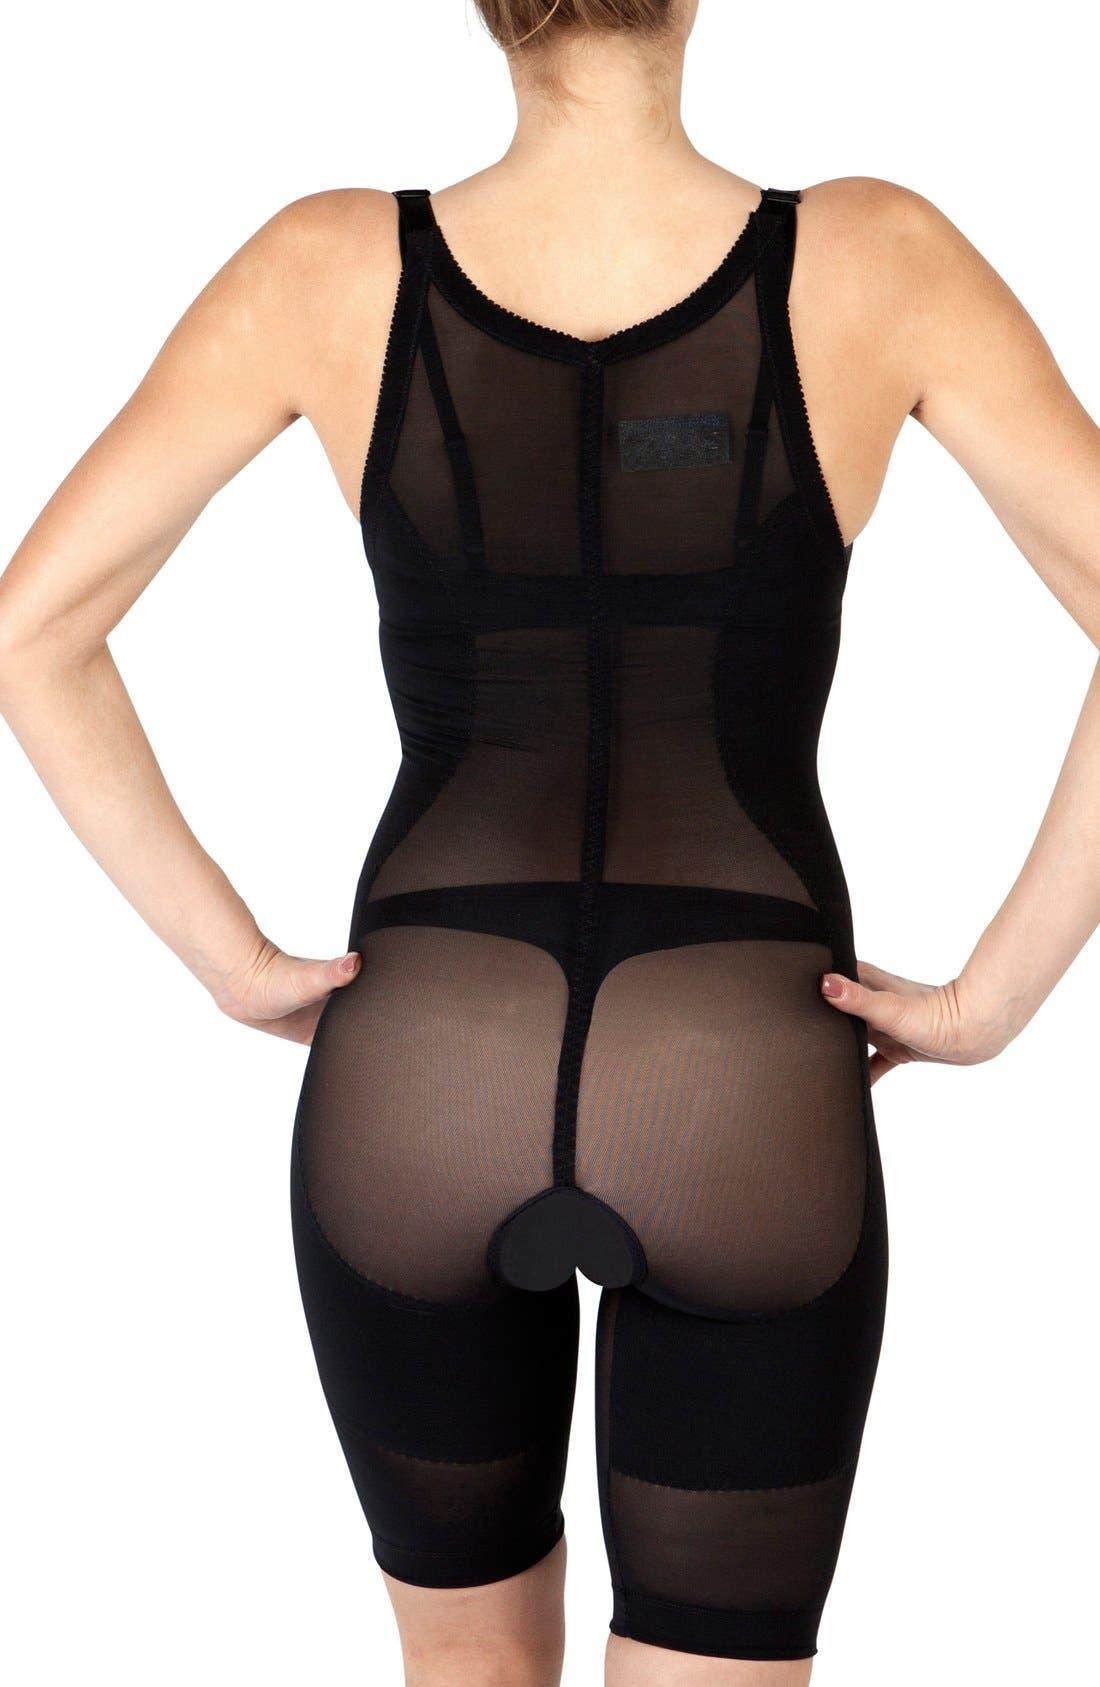 'Leilani' Body Shaping Garment,                             Alternate thumbnail 2, color,                             BLACK